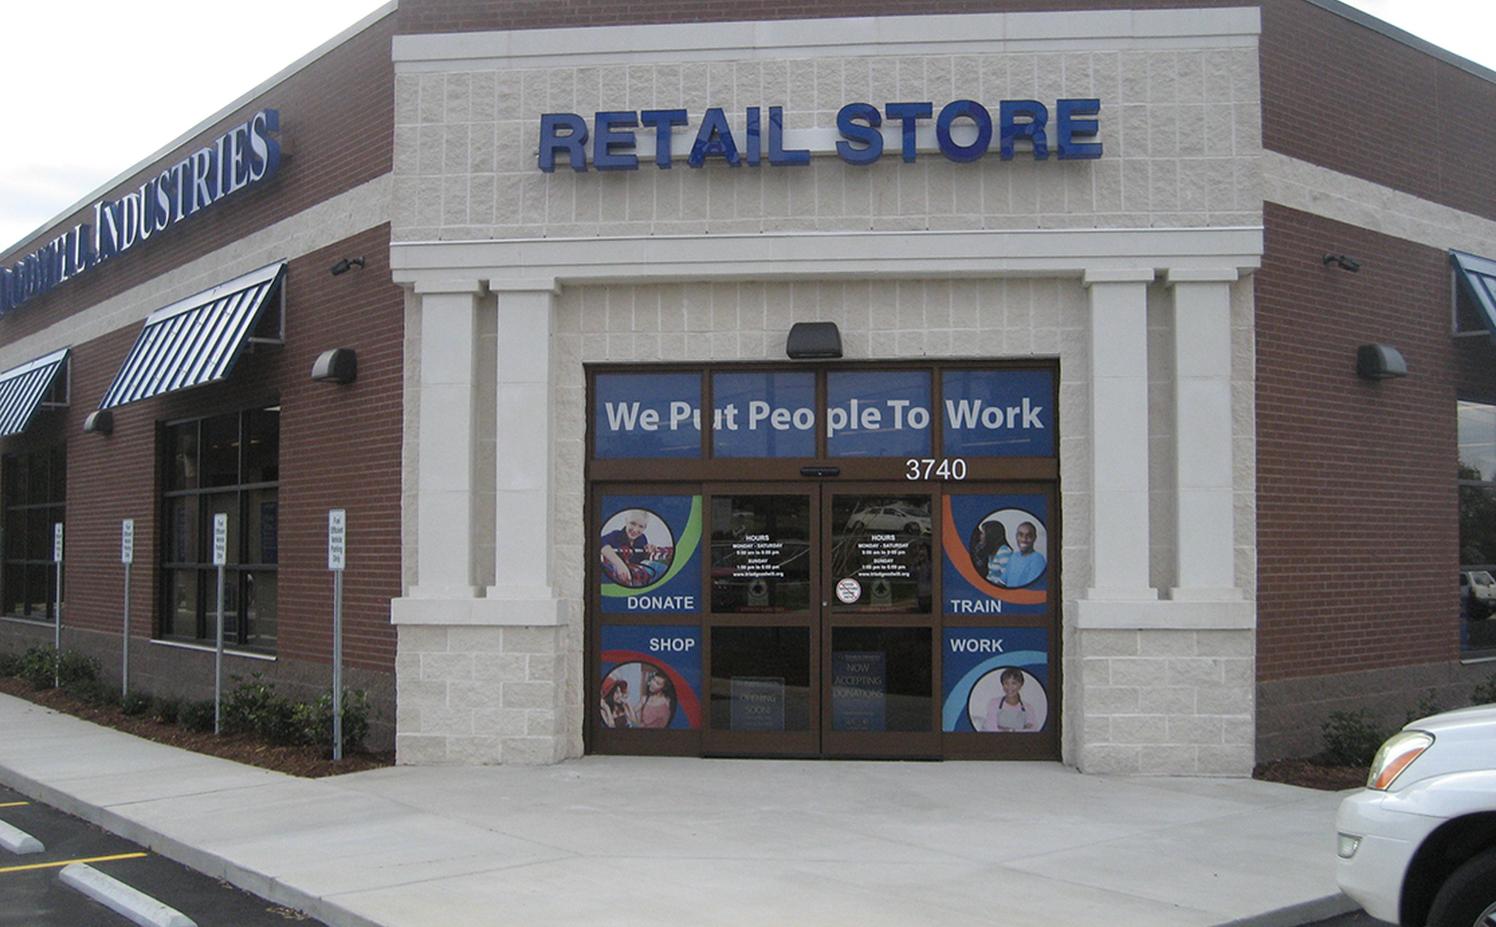 Goodwill Retail/Training Center